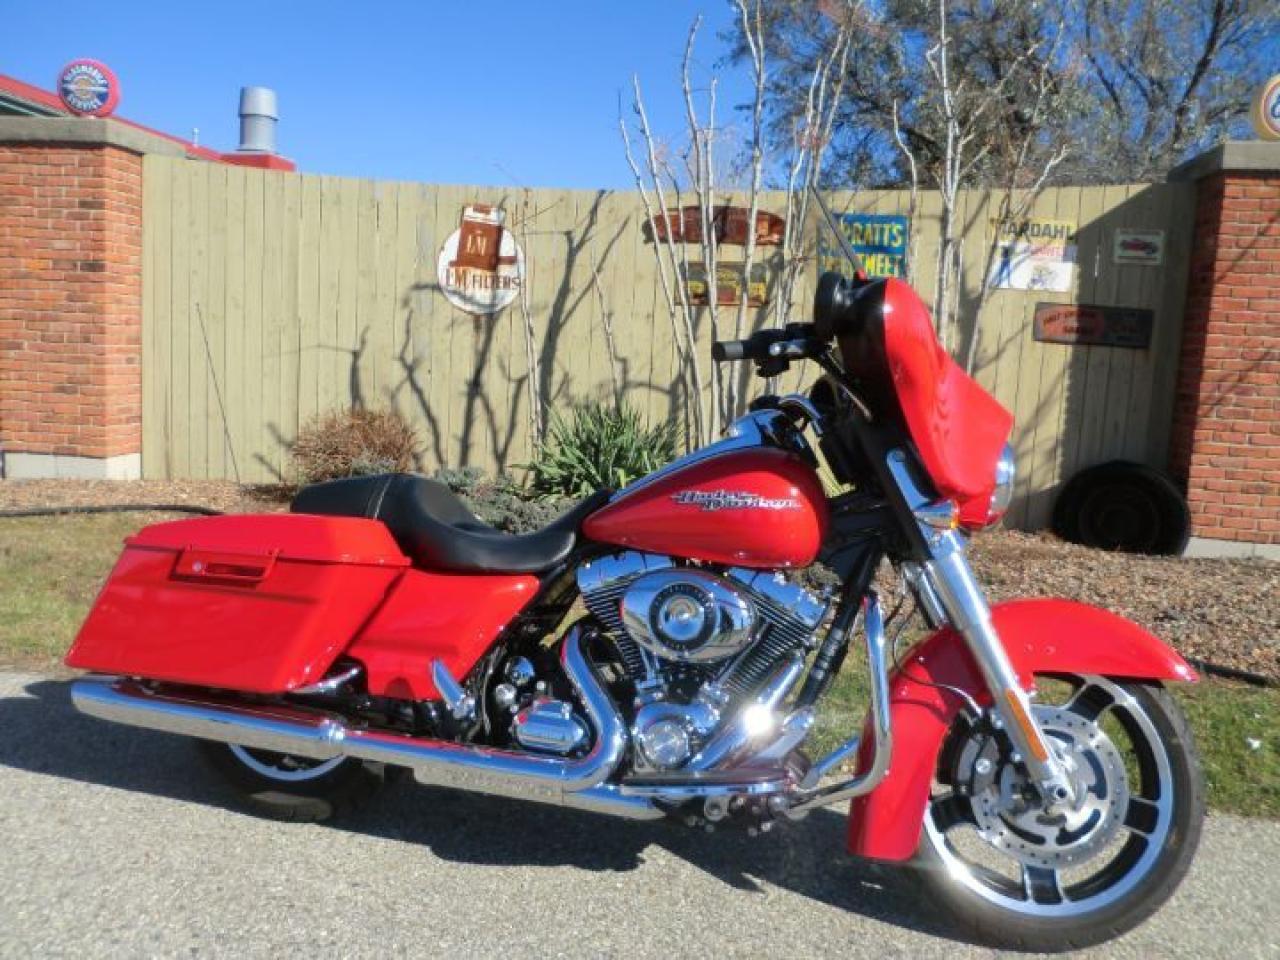 2010 Harley-Davidson Street Glide FLHX STREET GLIDE